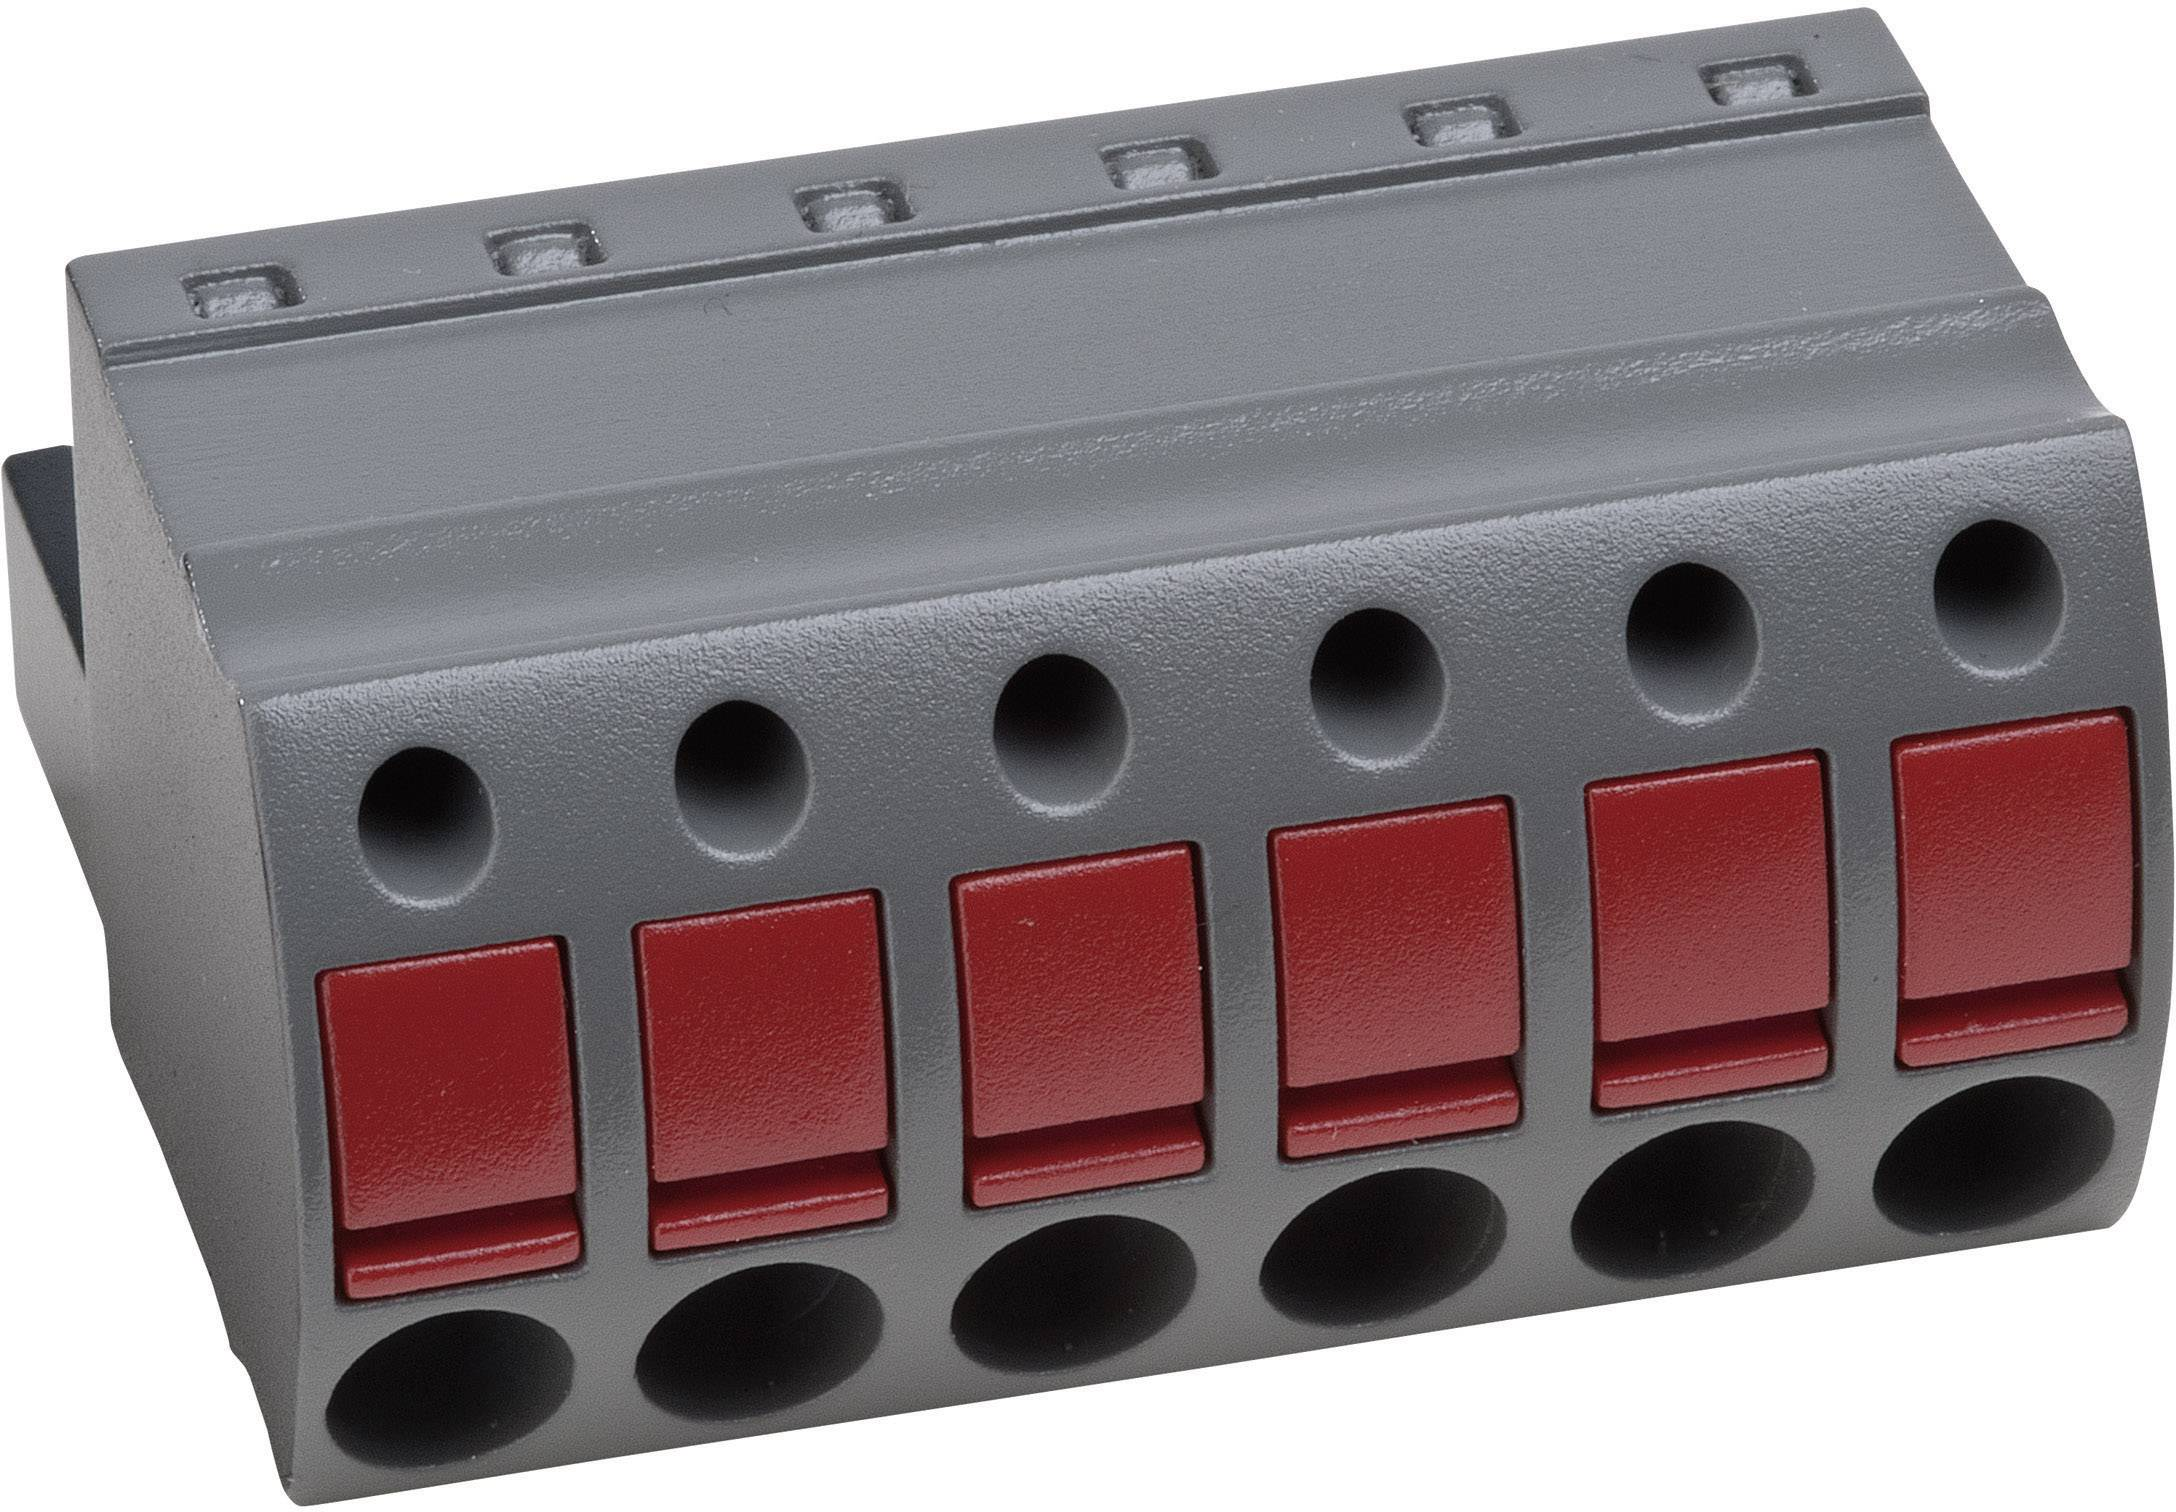 Zásuvkové púzdro na kábel PTR AK4951/2KD-5.0 54951020401D, 25.60 mm, pólů 2, rozteč 5 mm, 1 ks